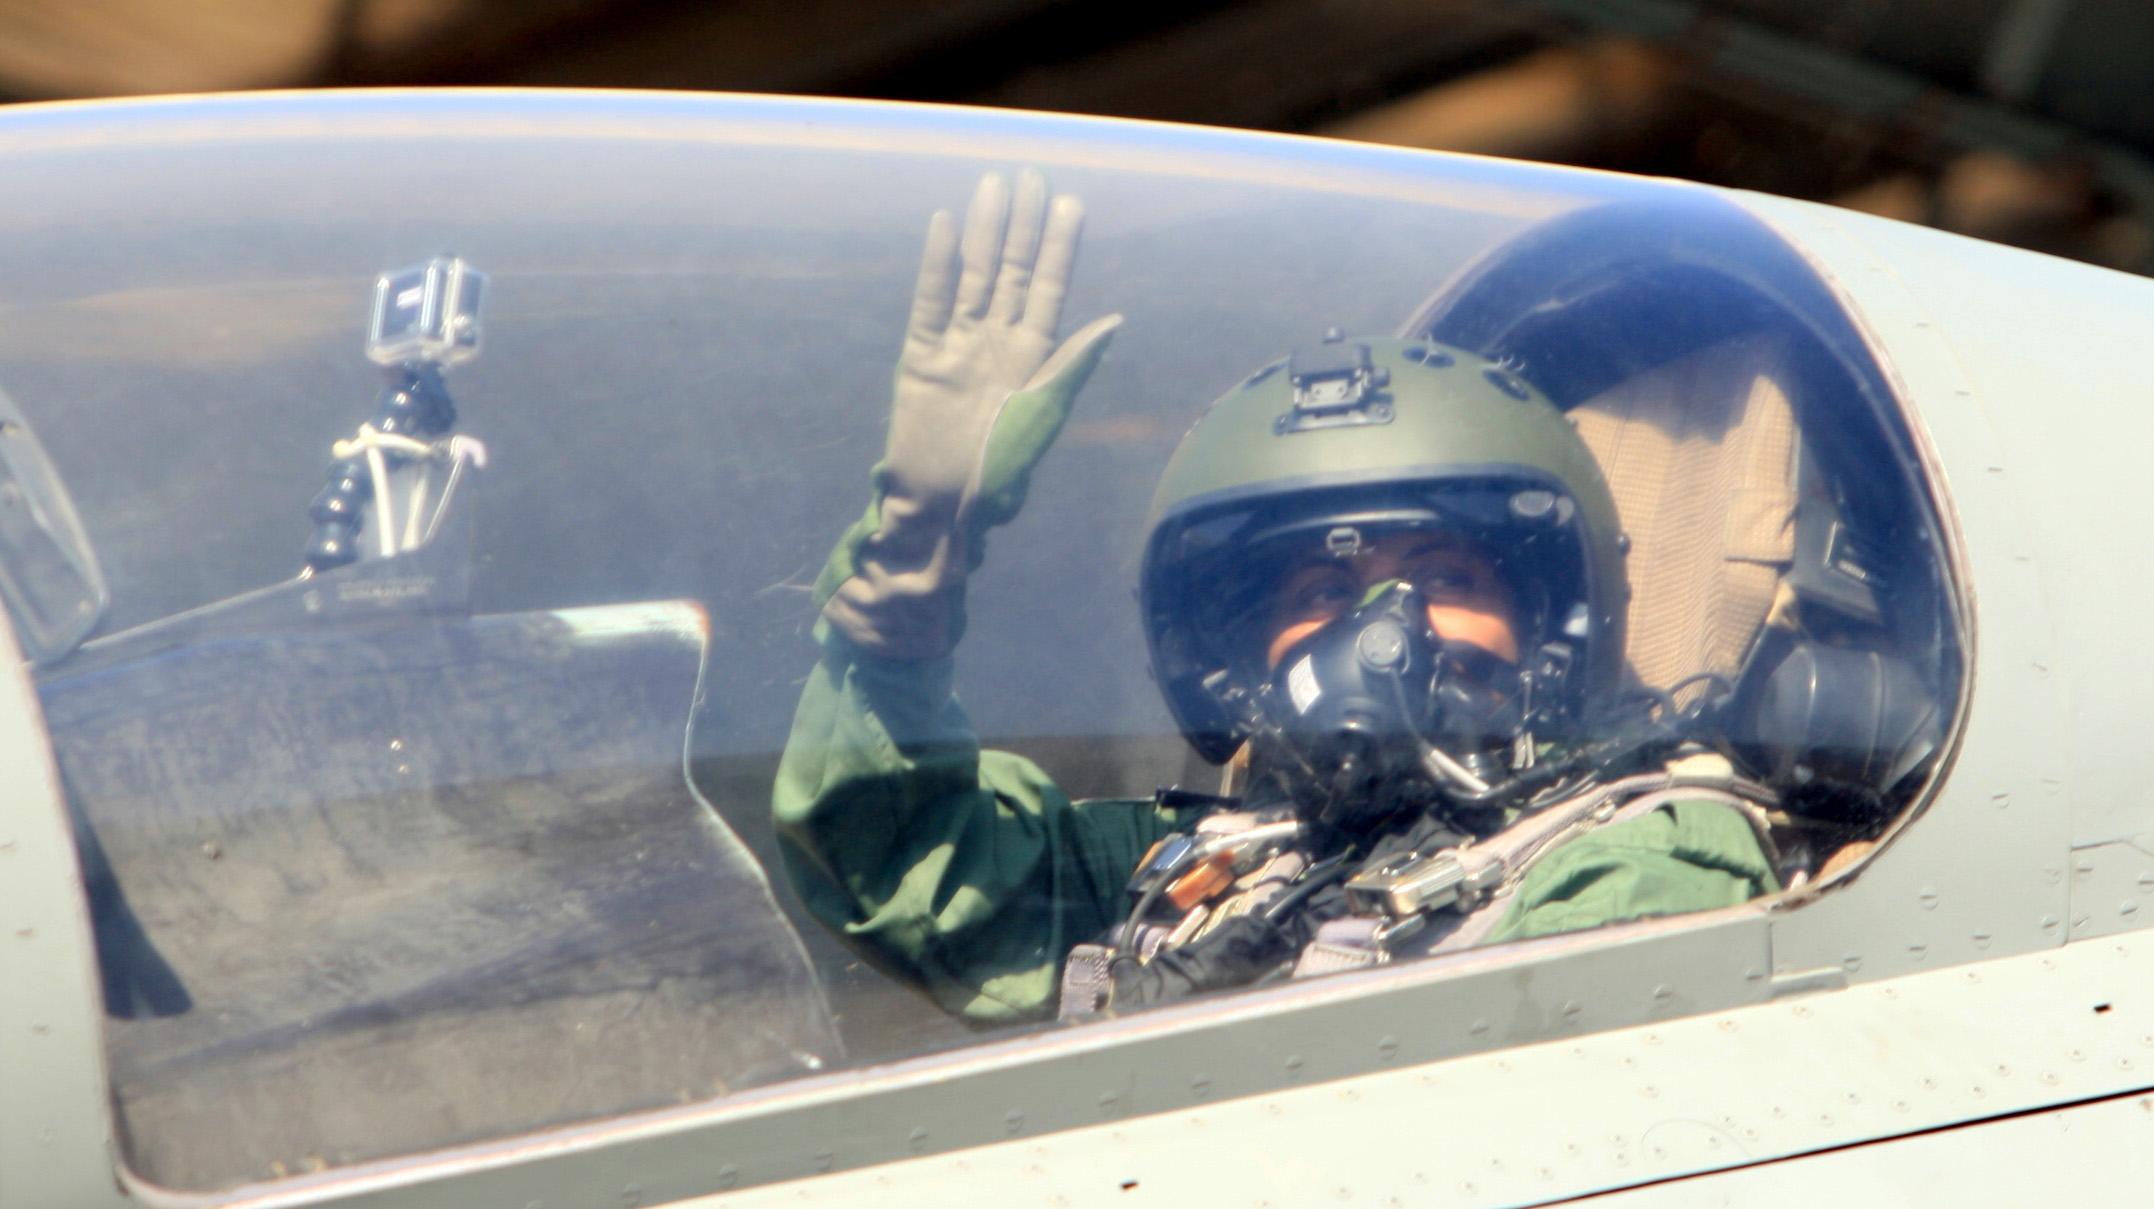 Nirmala Sitharaman inside cockpit of Sukhoi-30 MKI as she undertakes sortie